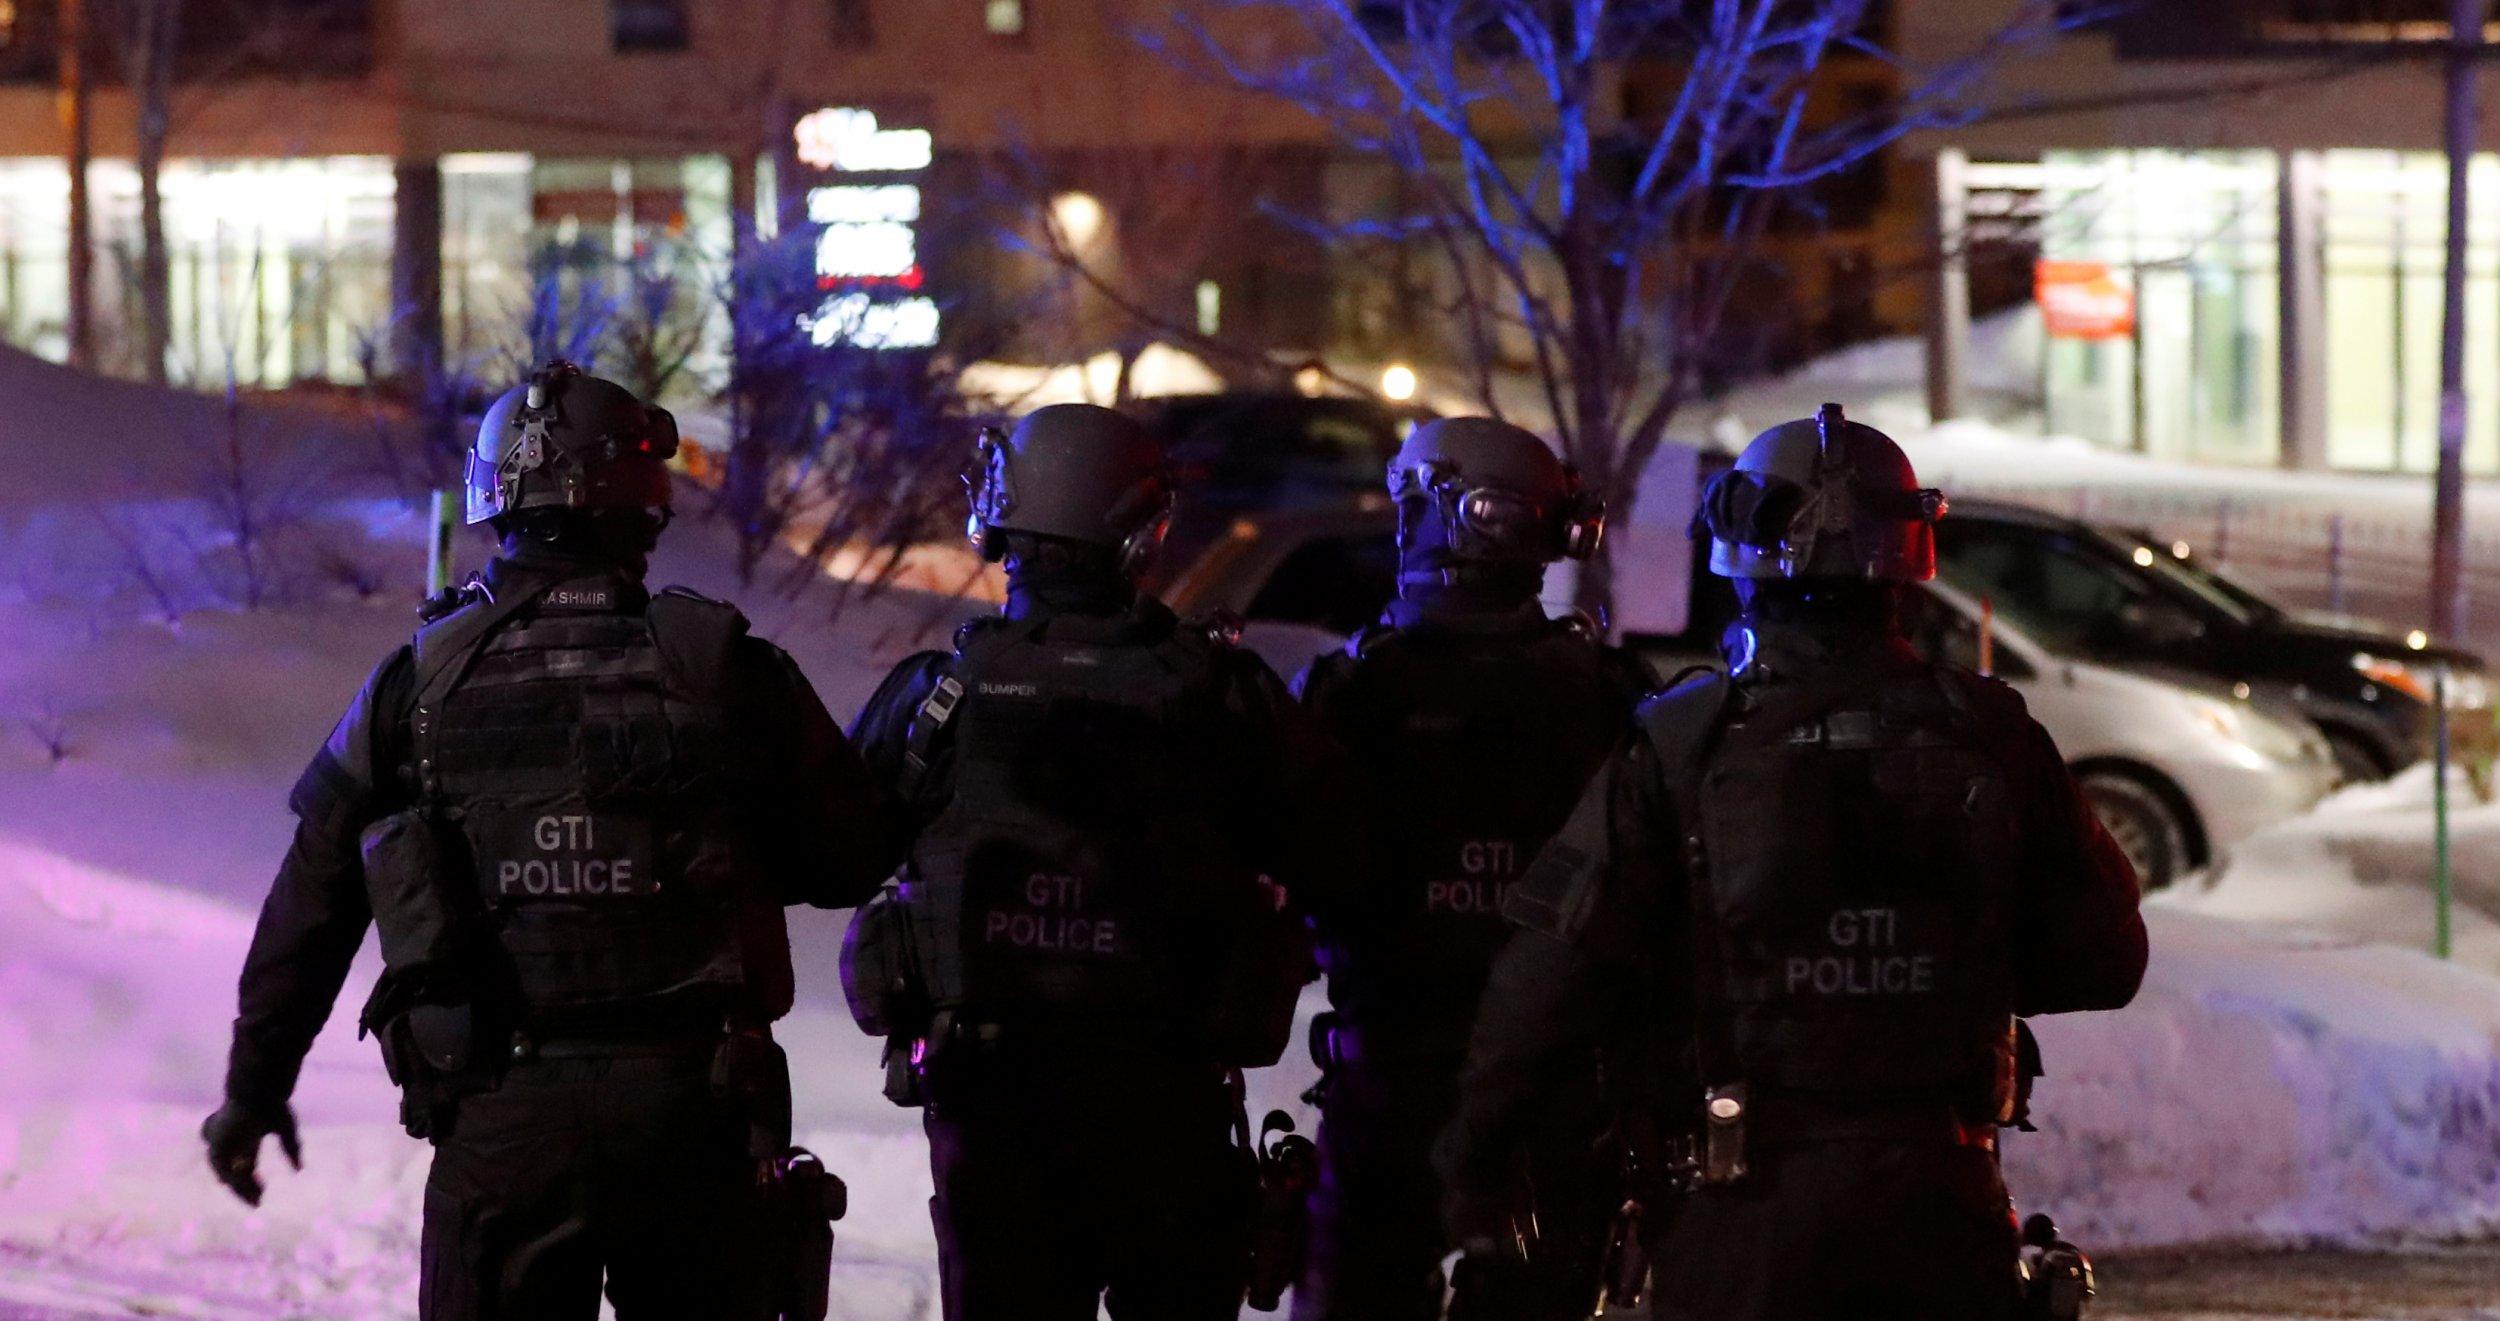 Mosque Shooting: Canadian PM Justin Trudeau Calls Quebec City Mosque